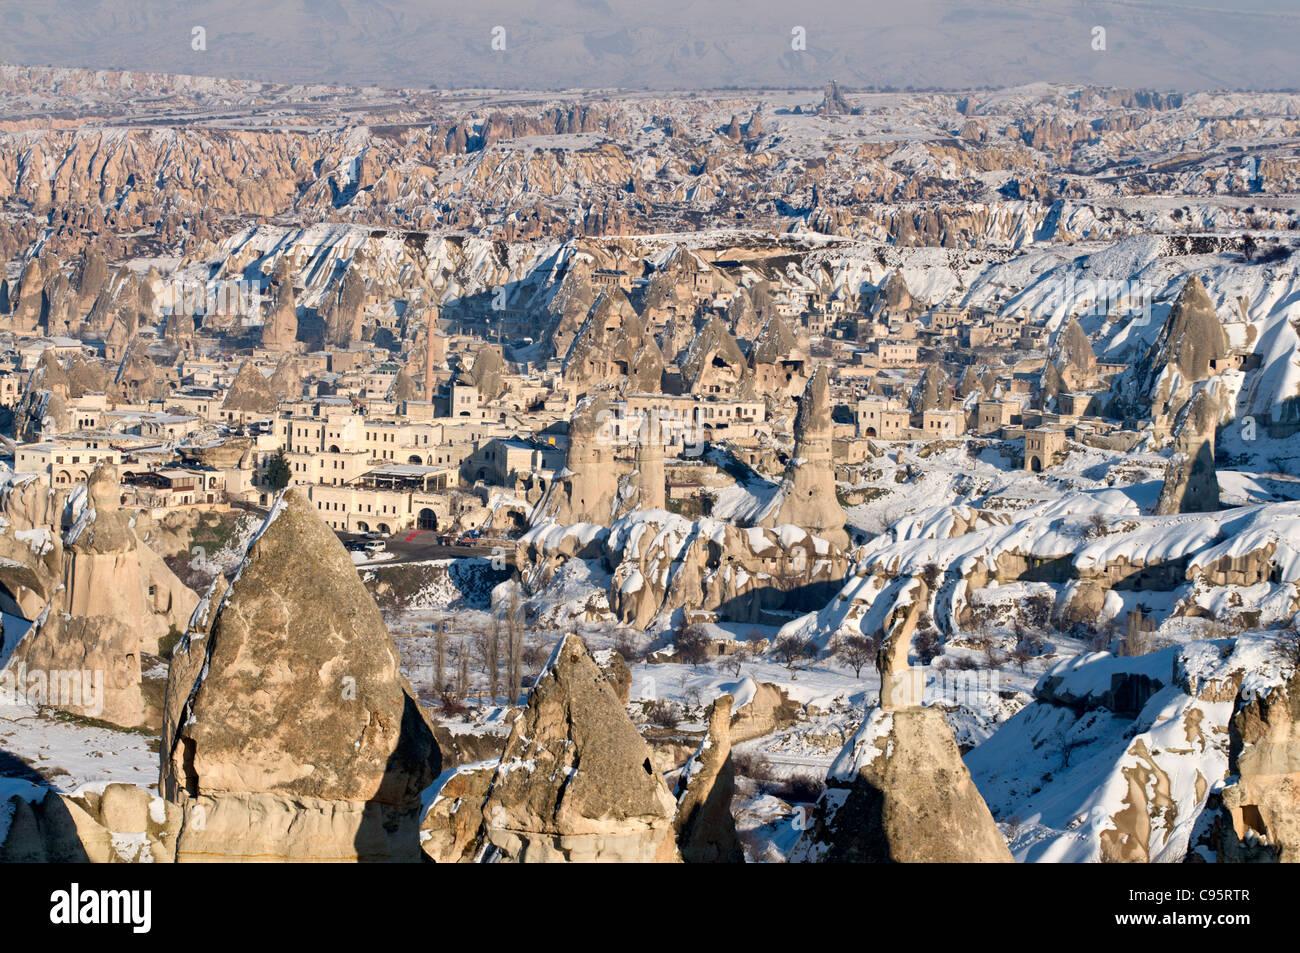 A Snowy day in Goreme,Cappadocia,Nevsehir,Turkey - Stock Image